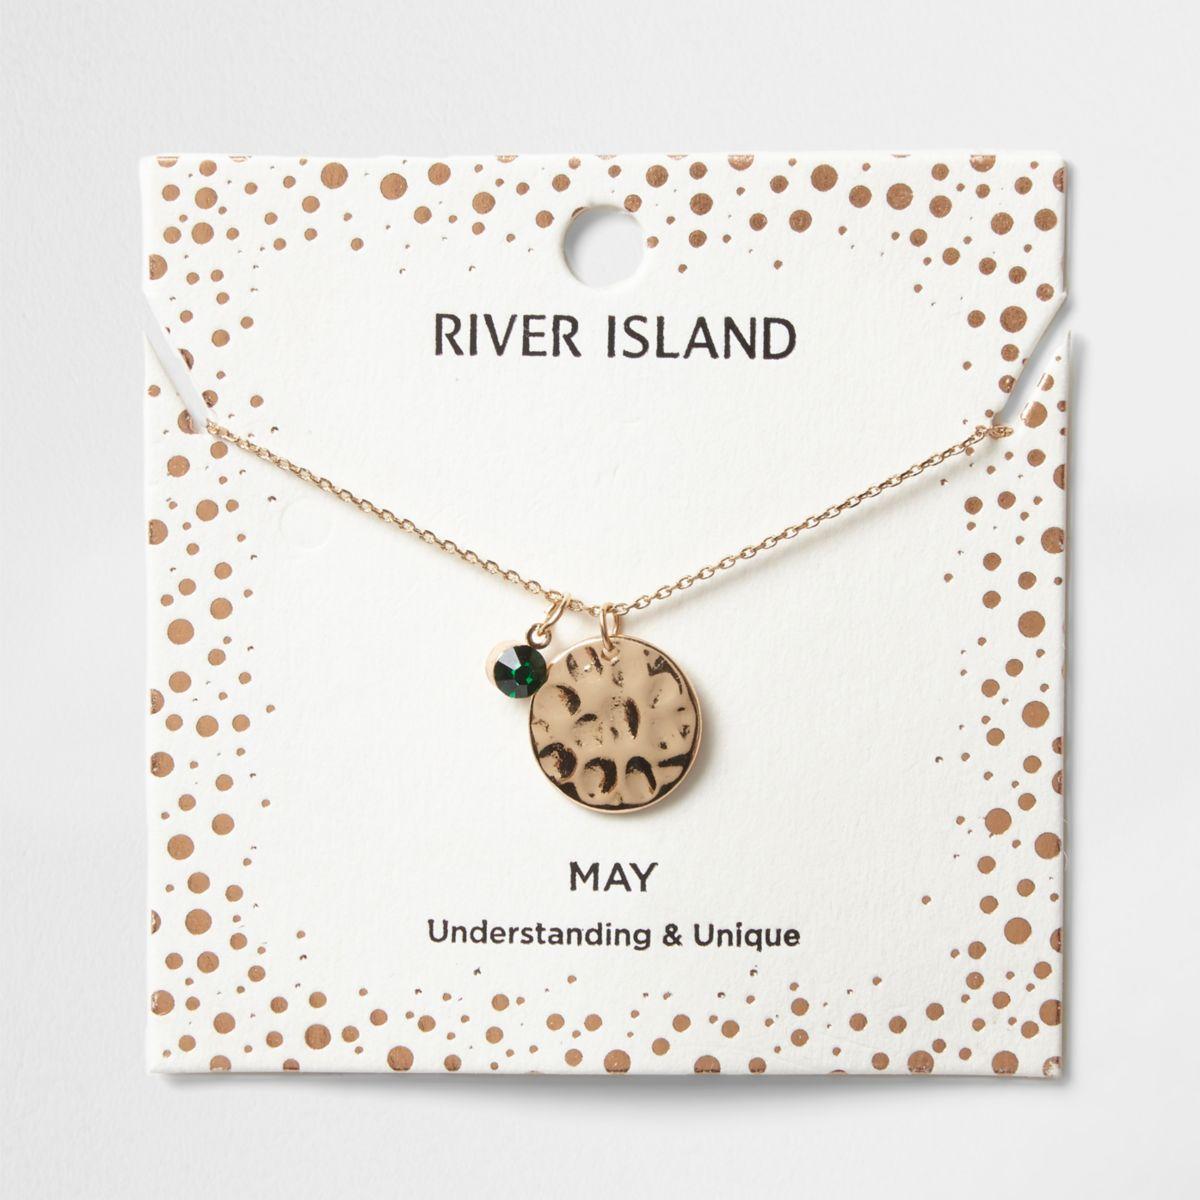 Green gem May birthstone necklace